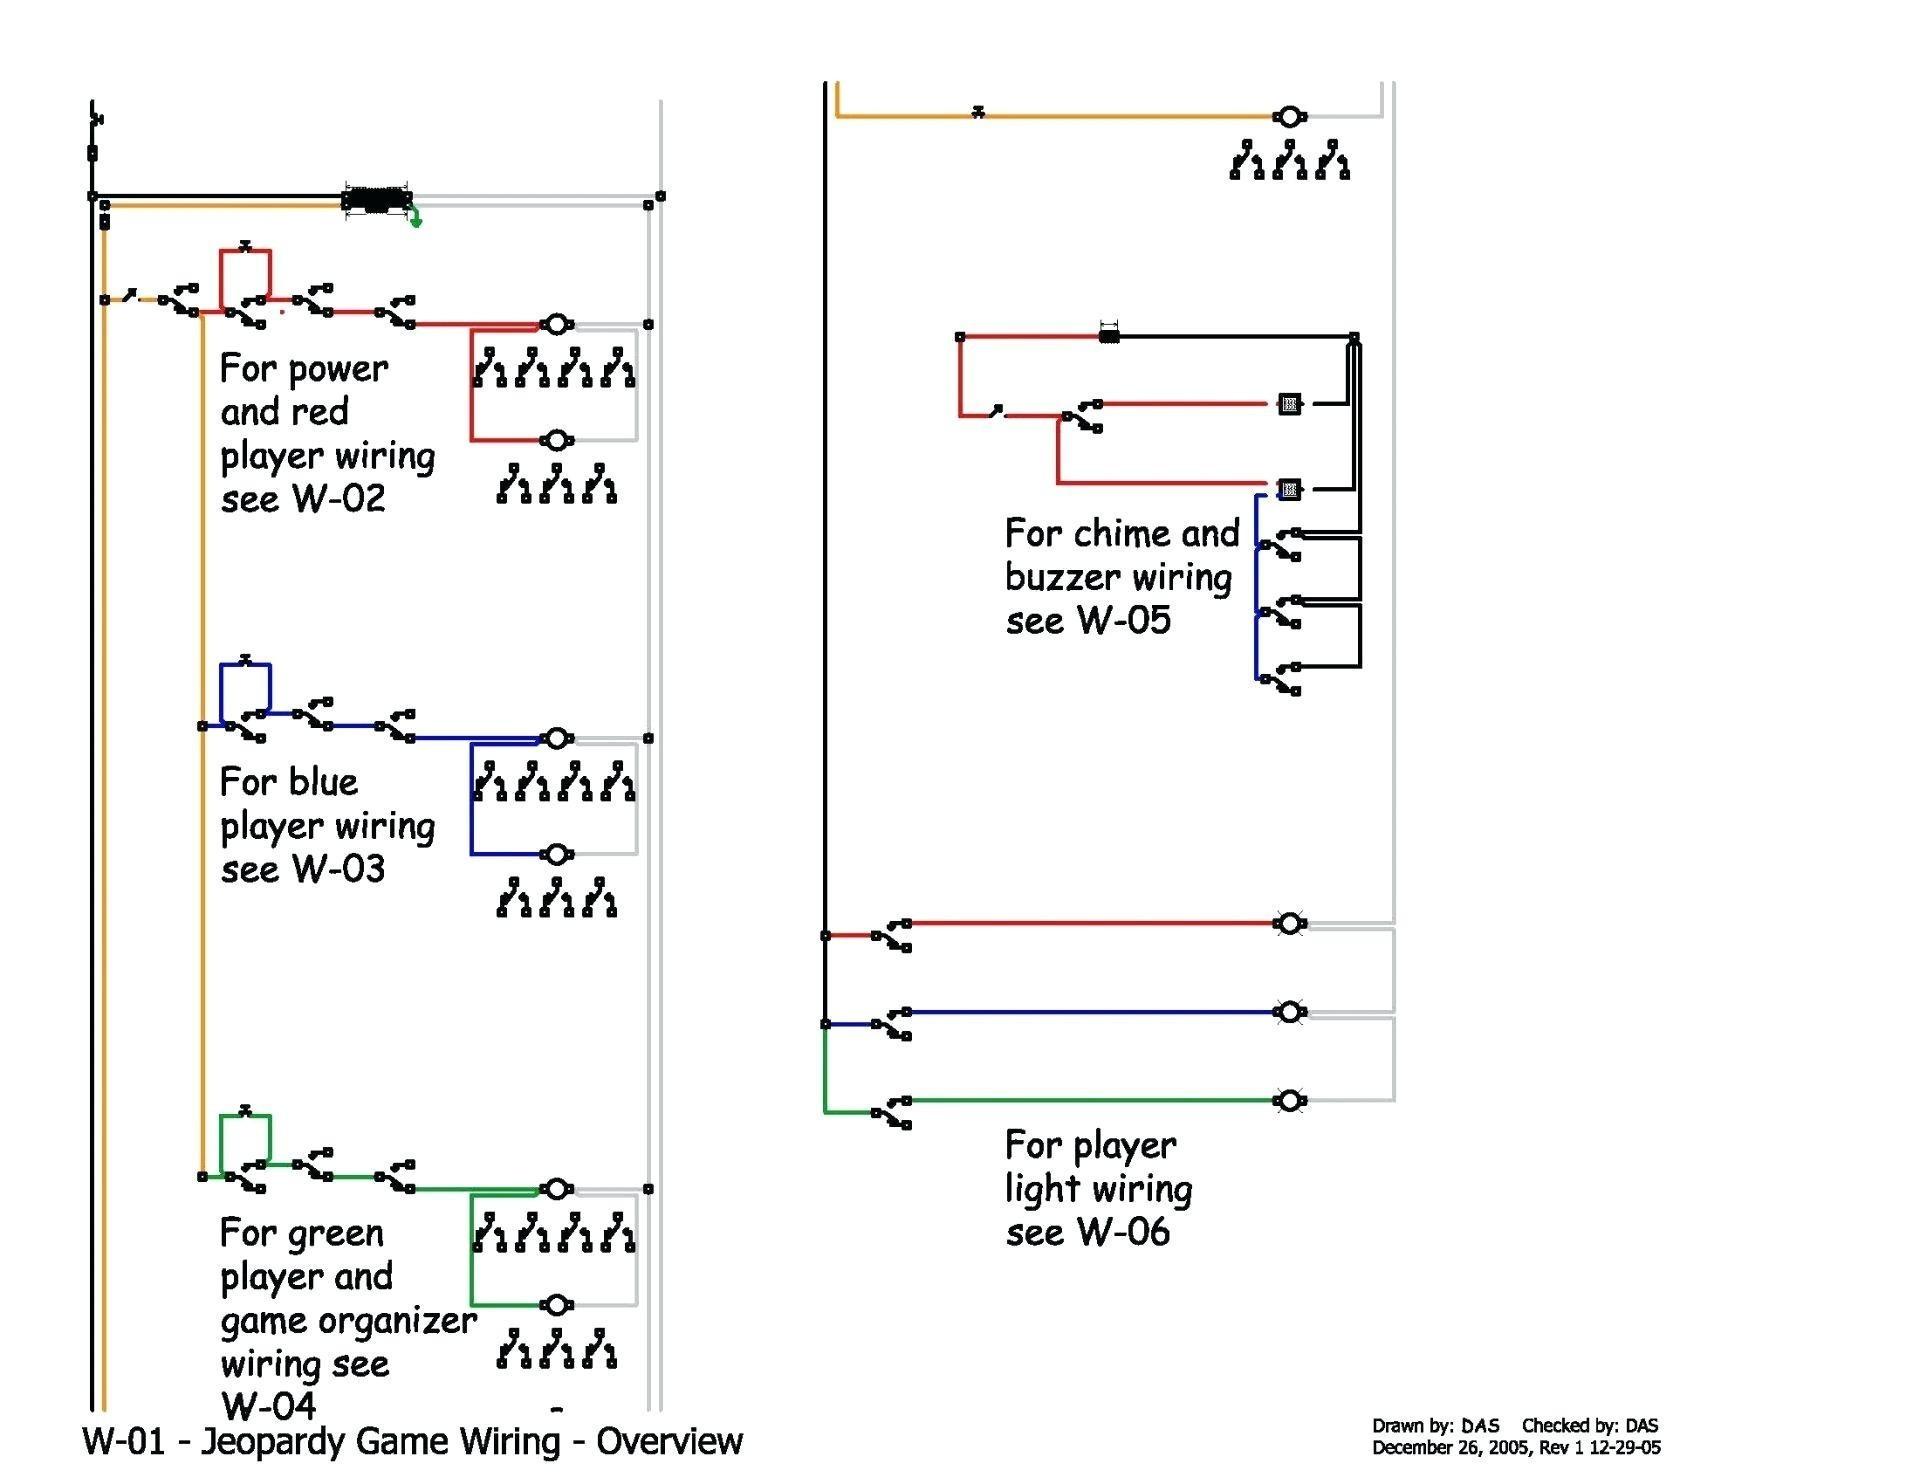 piaa driving lights wiring diagram fresh driving lights wiring rh wheathill co piaa 510 wiring diagram